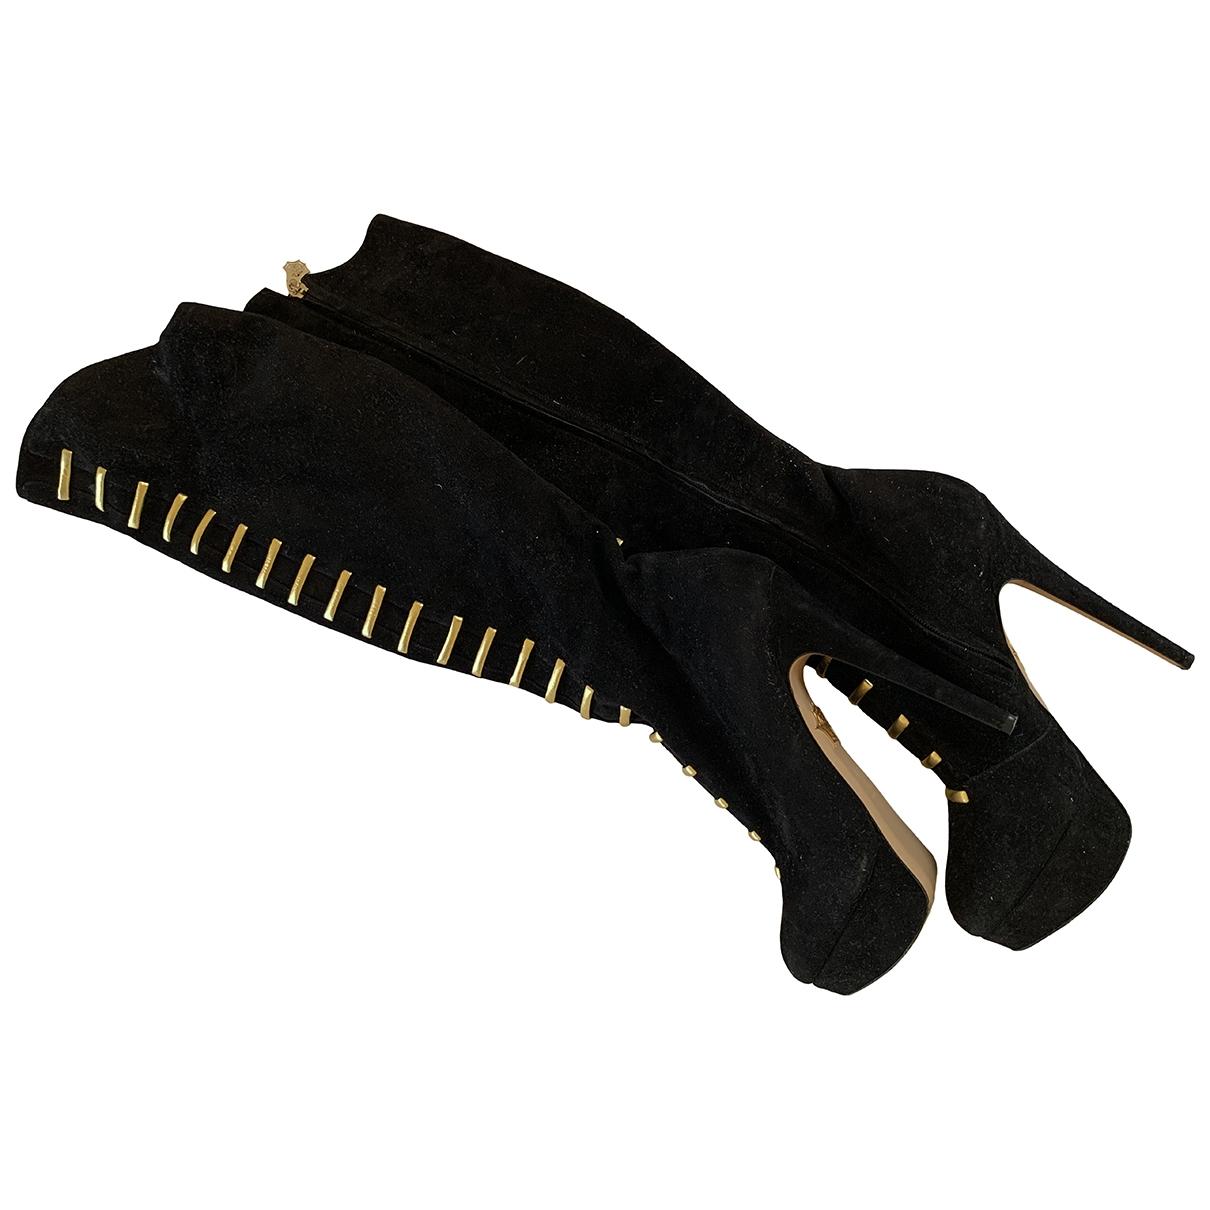 Sophia Webster \N Black Suede Boots for Women 39 EU